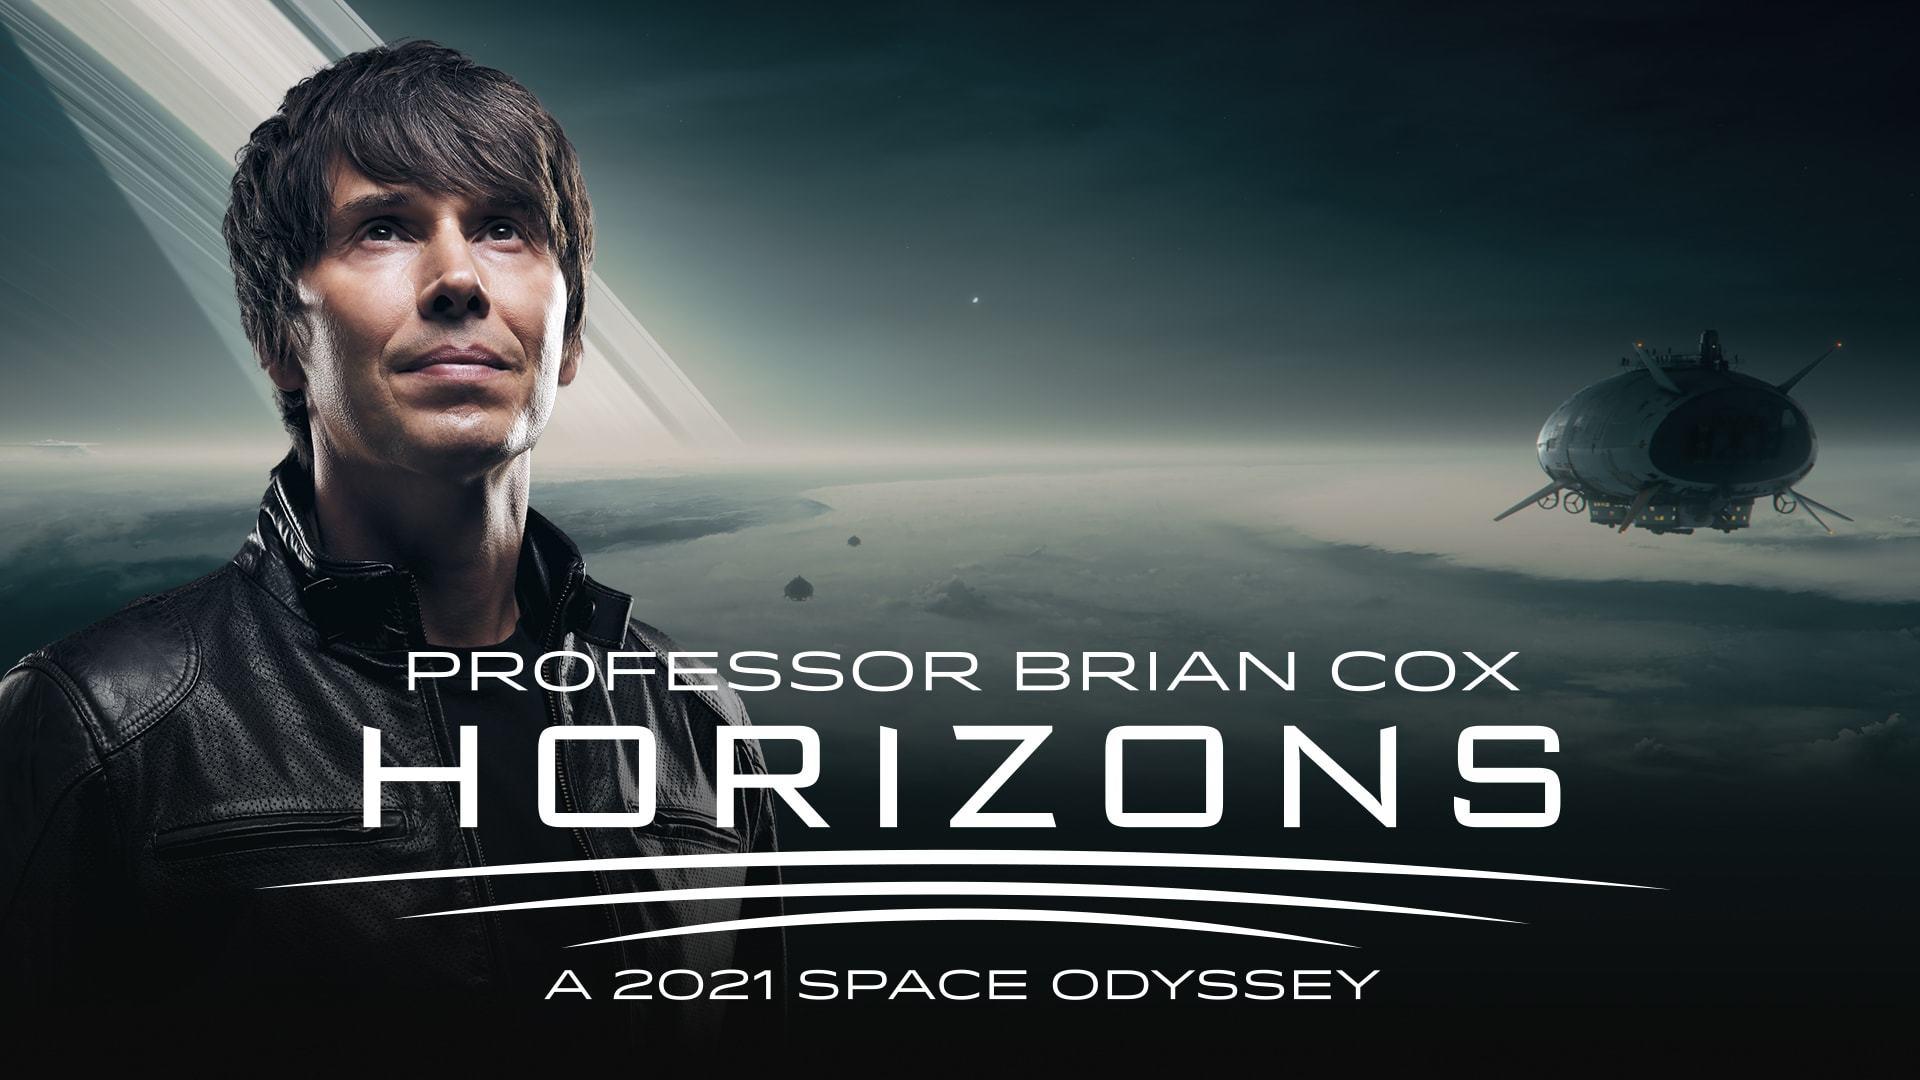 Professor Brian Cox Horizons World Tour Title 1920x1080